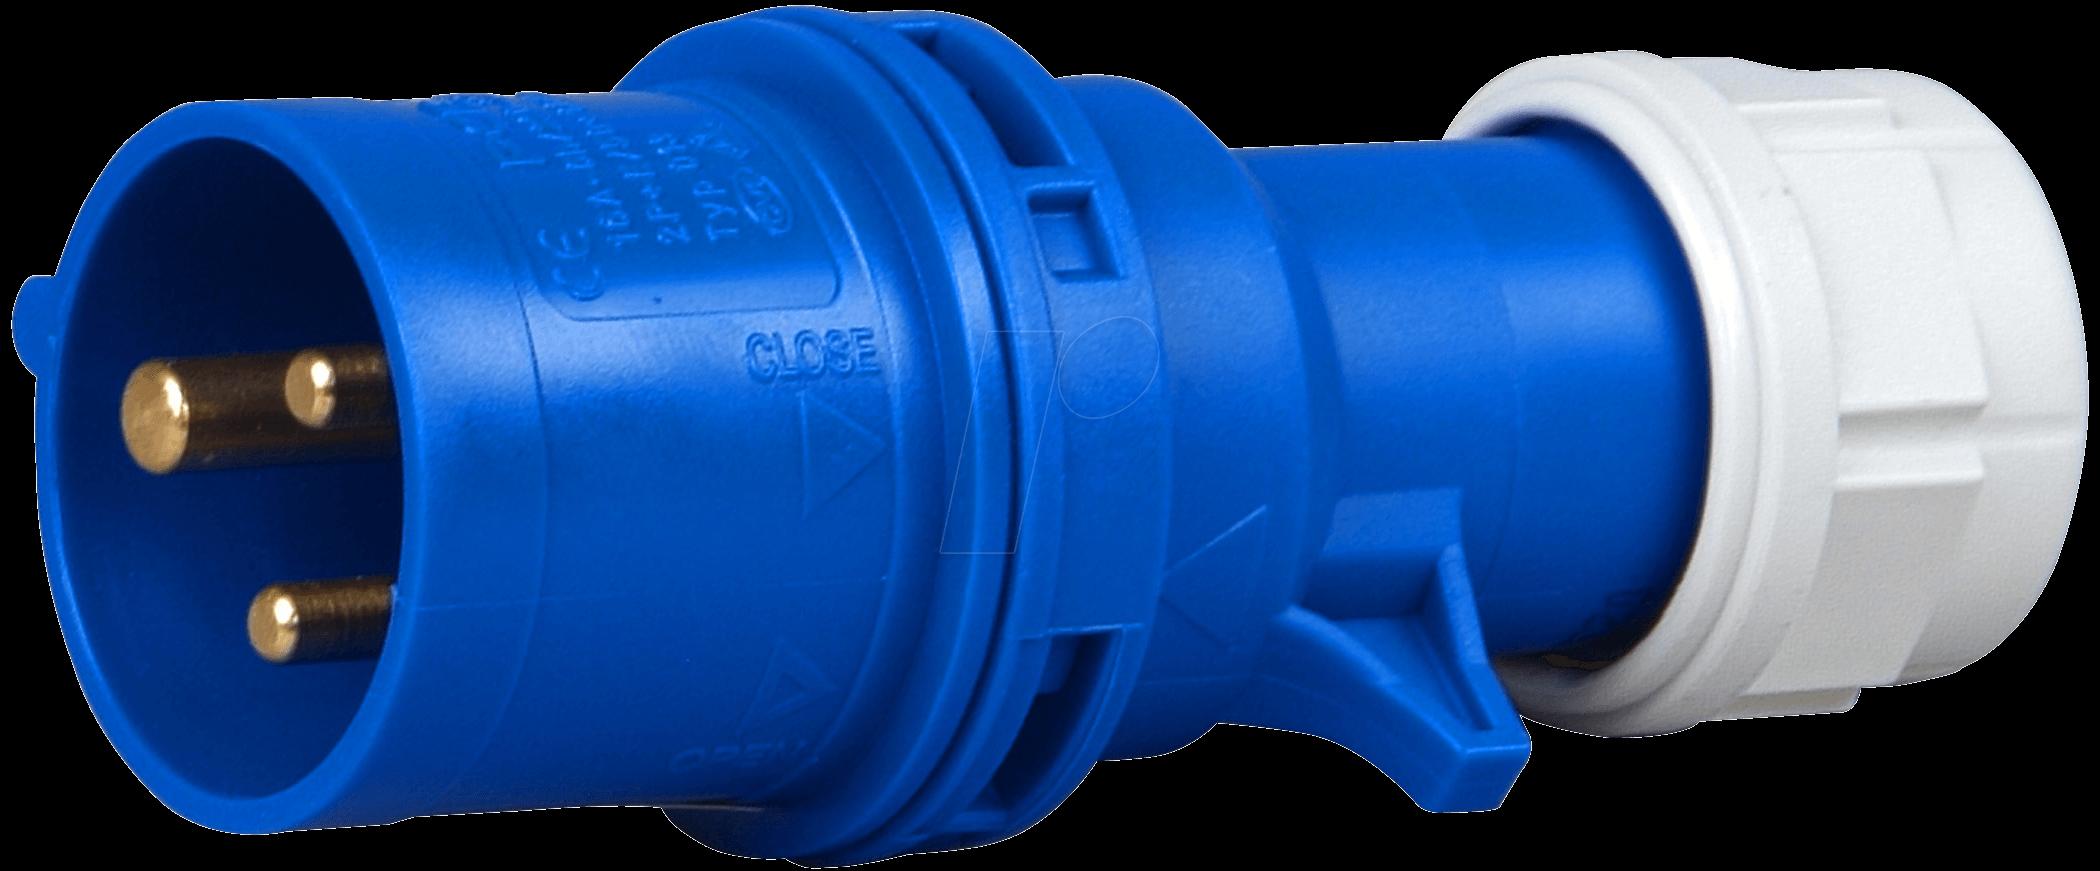 CEE Stecker 16-3, 230V, 16A, blau